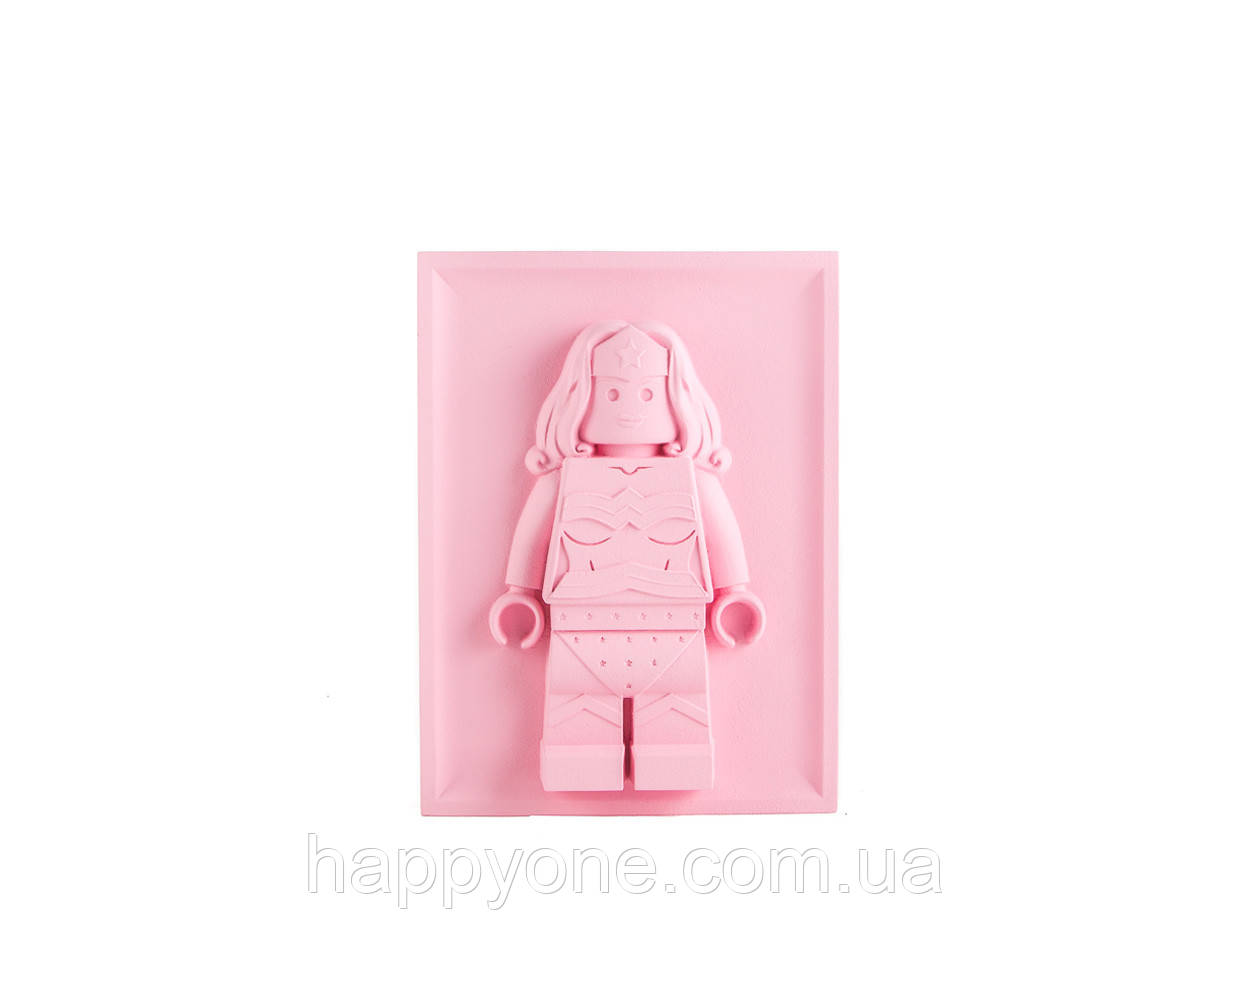 Барельеф Скульптура Лего Wonder Woman